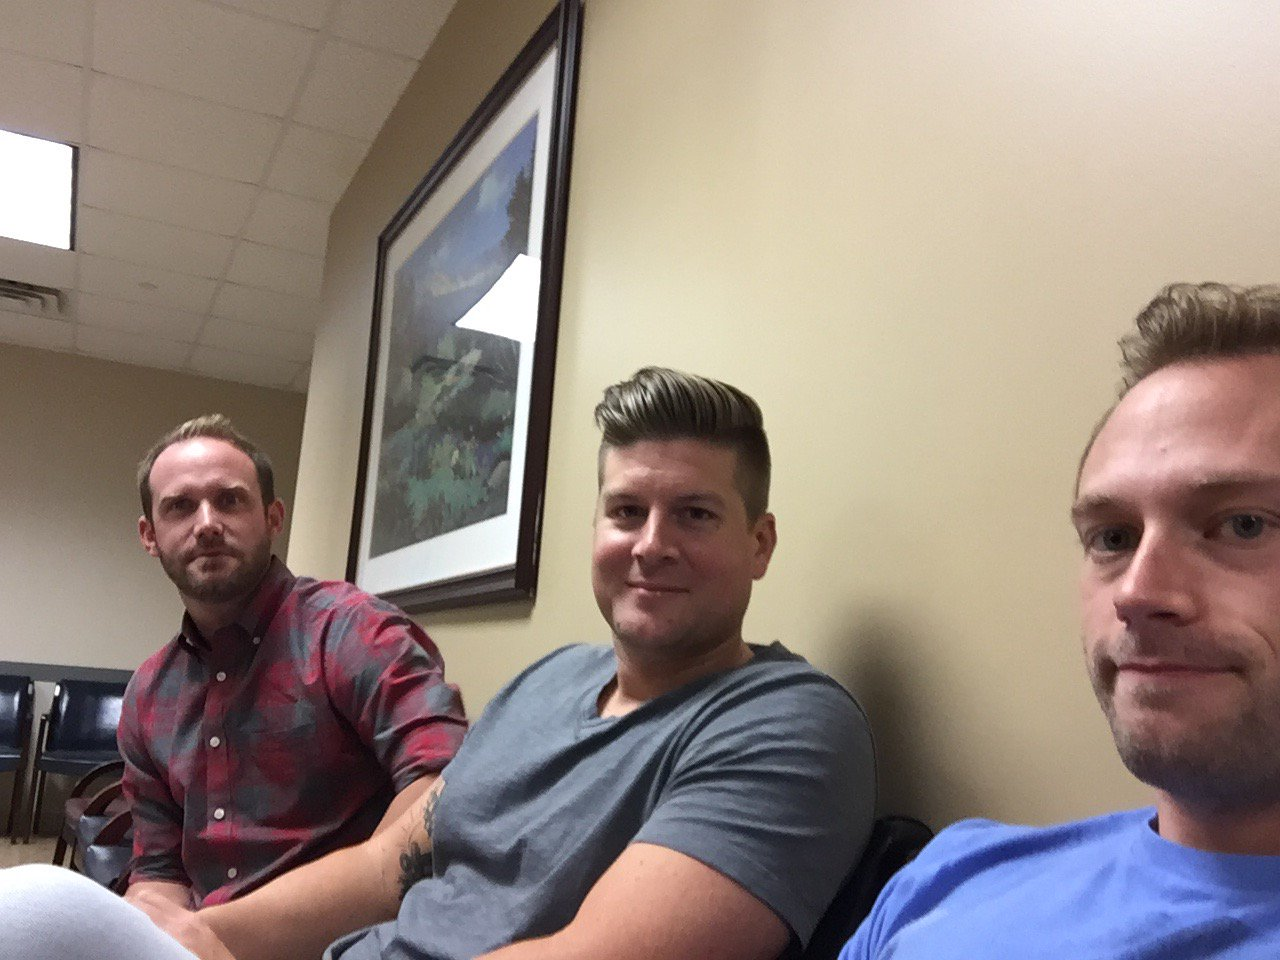 Adam Busby On Twitter The Waiting Room Selfie